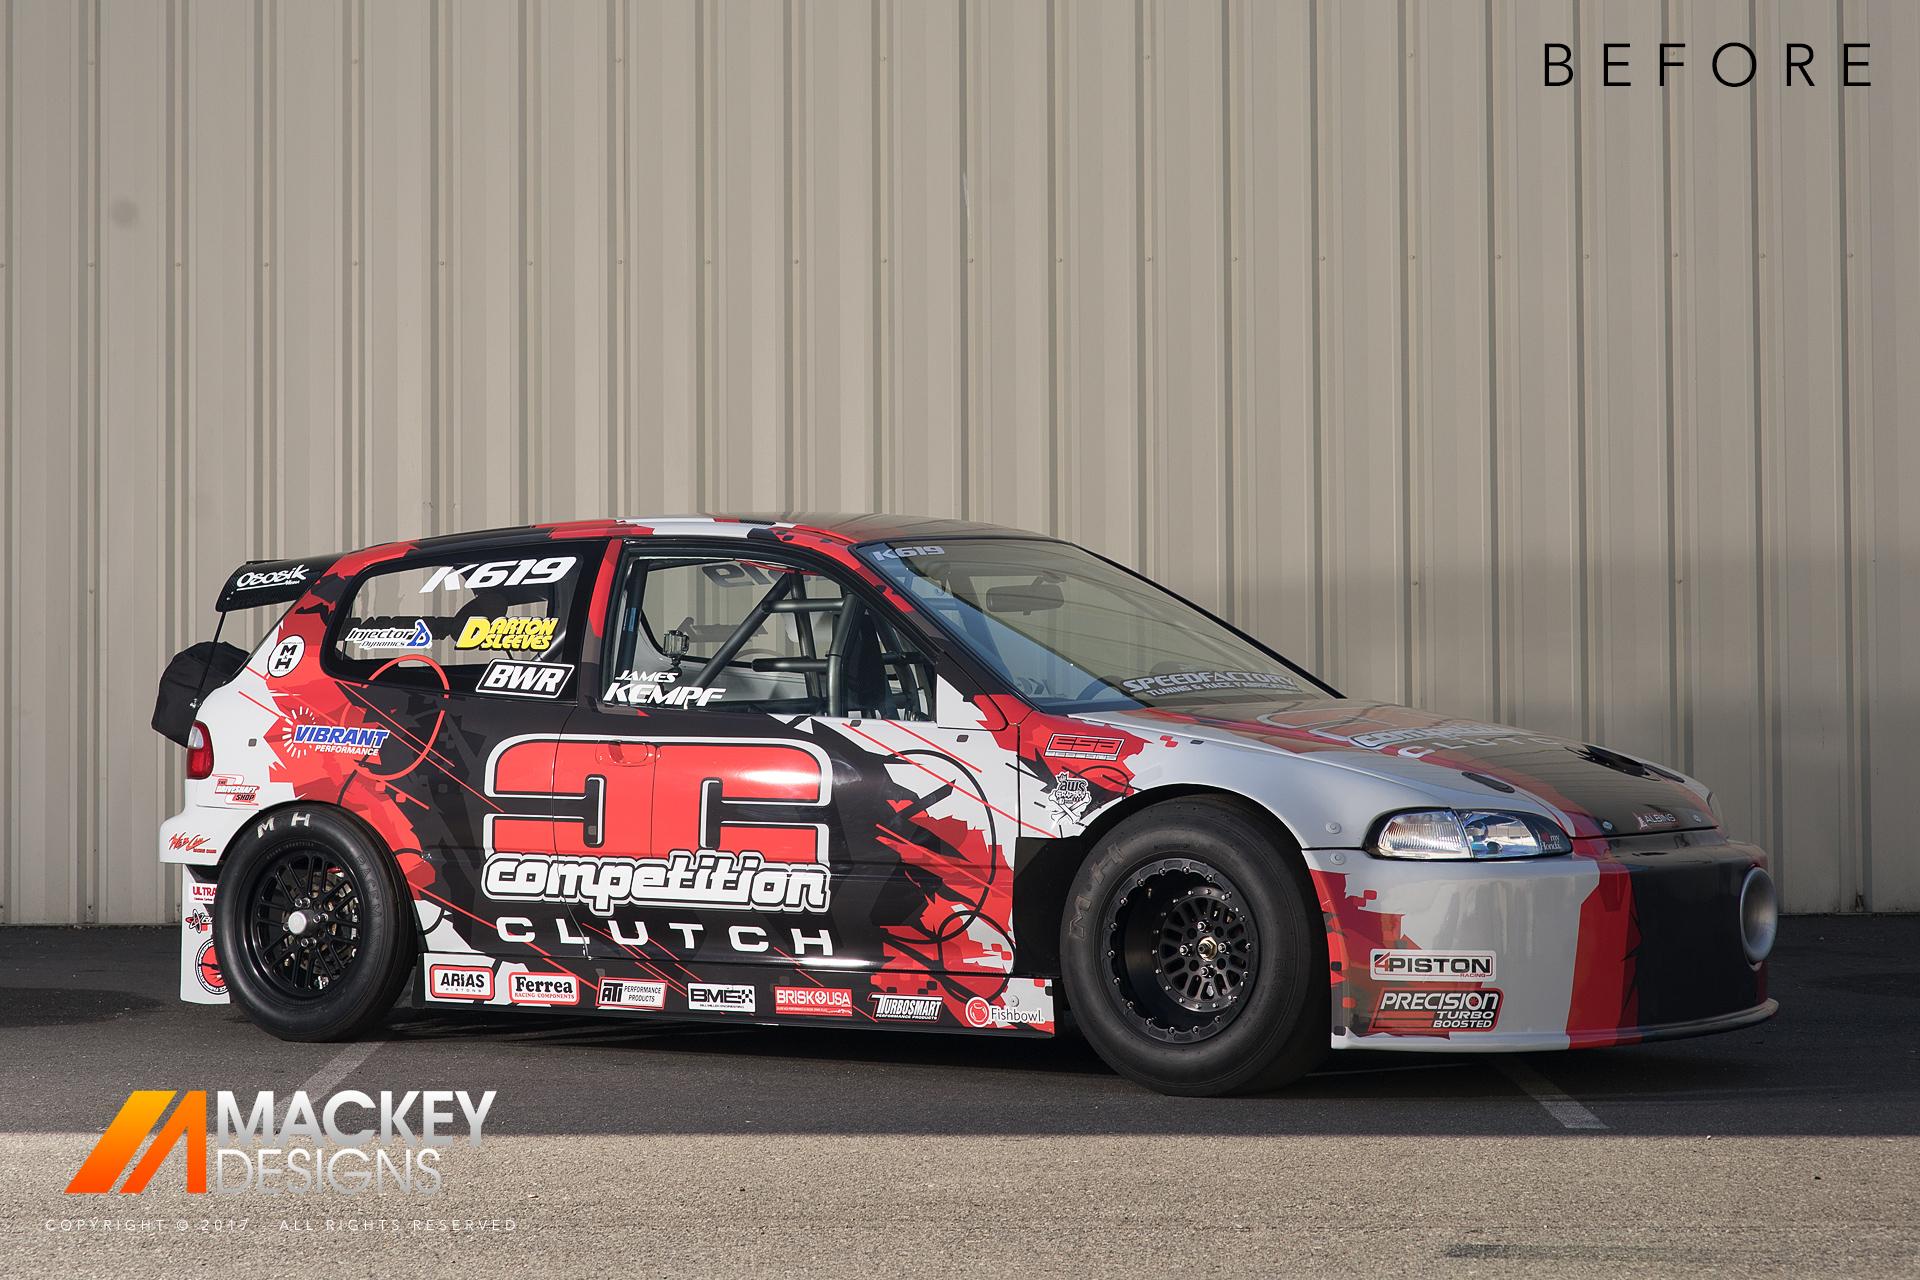 Automotive Photographer - Seattle - Josh Mackey - SpeedFactory Civic Before